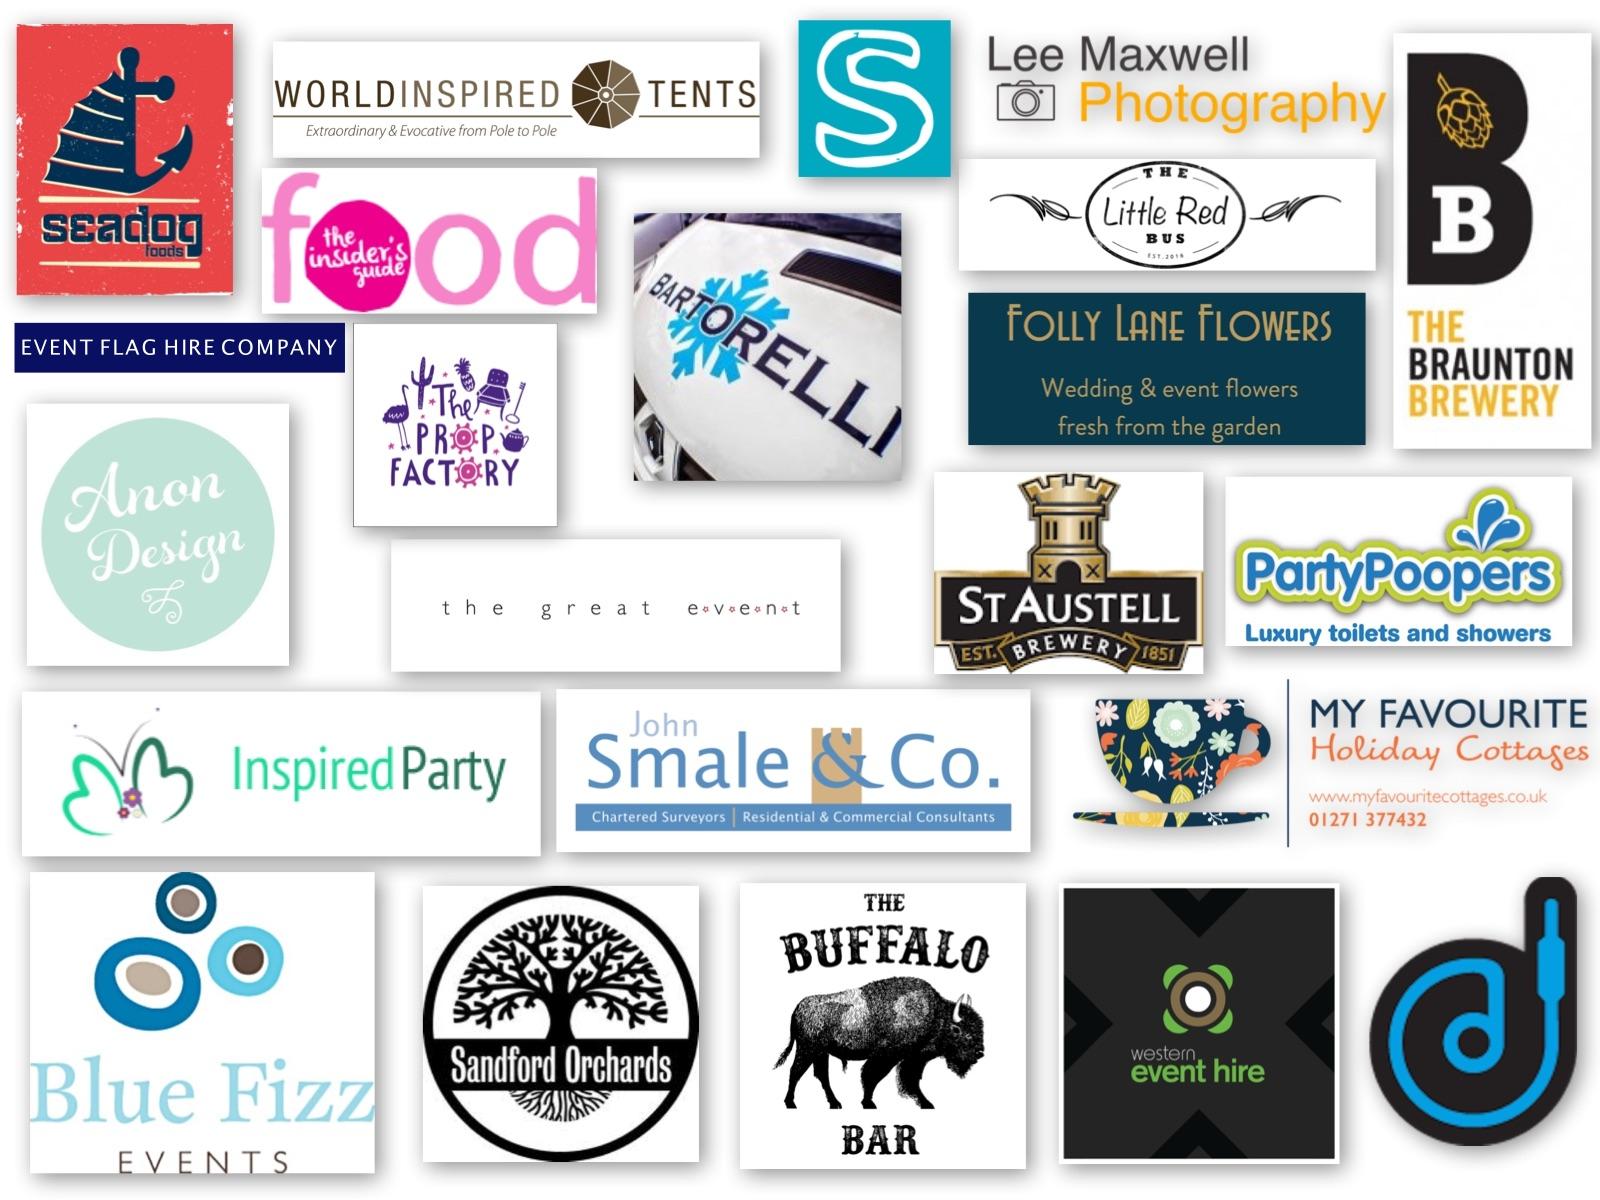 barefoot 2017 sponsors logos 6